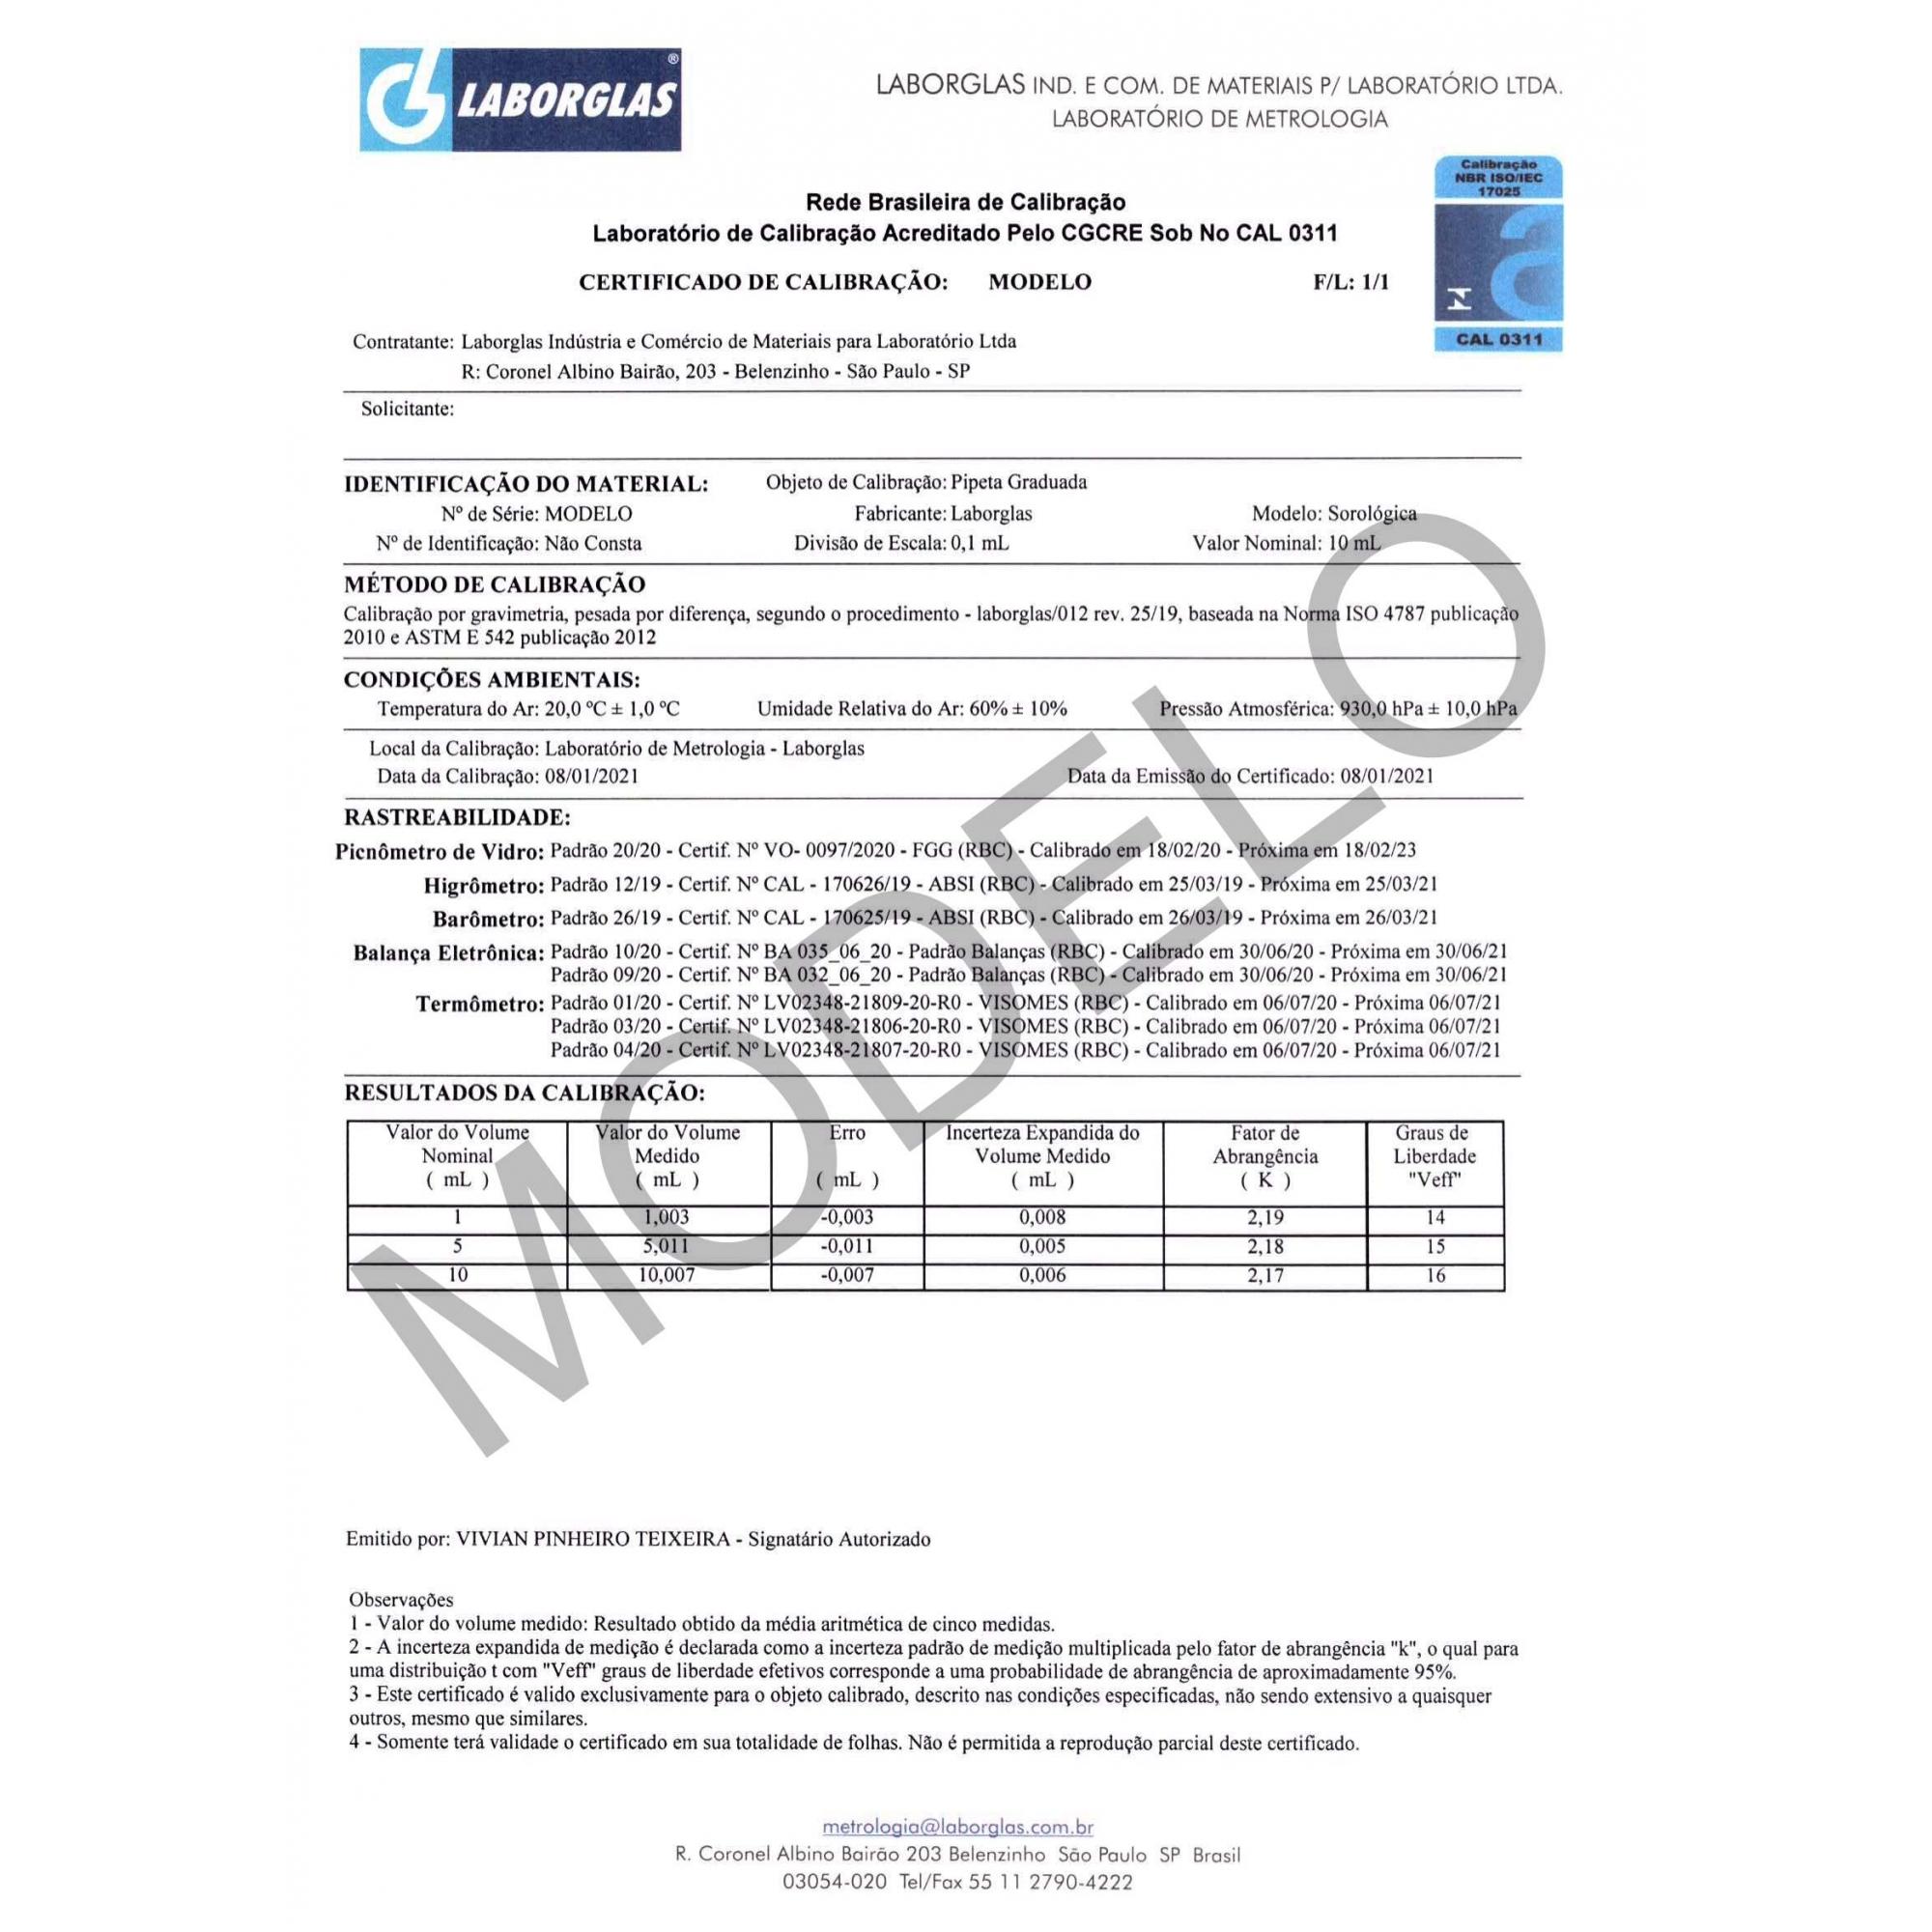 PIPETA GRAD. SOROL. ESGOT. TOTAL 0,2 ML 1/1000 COM CERTIFICADO RBC - Laborglas - Cód. 9434304-R